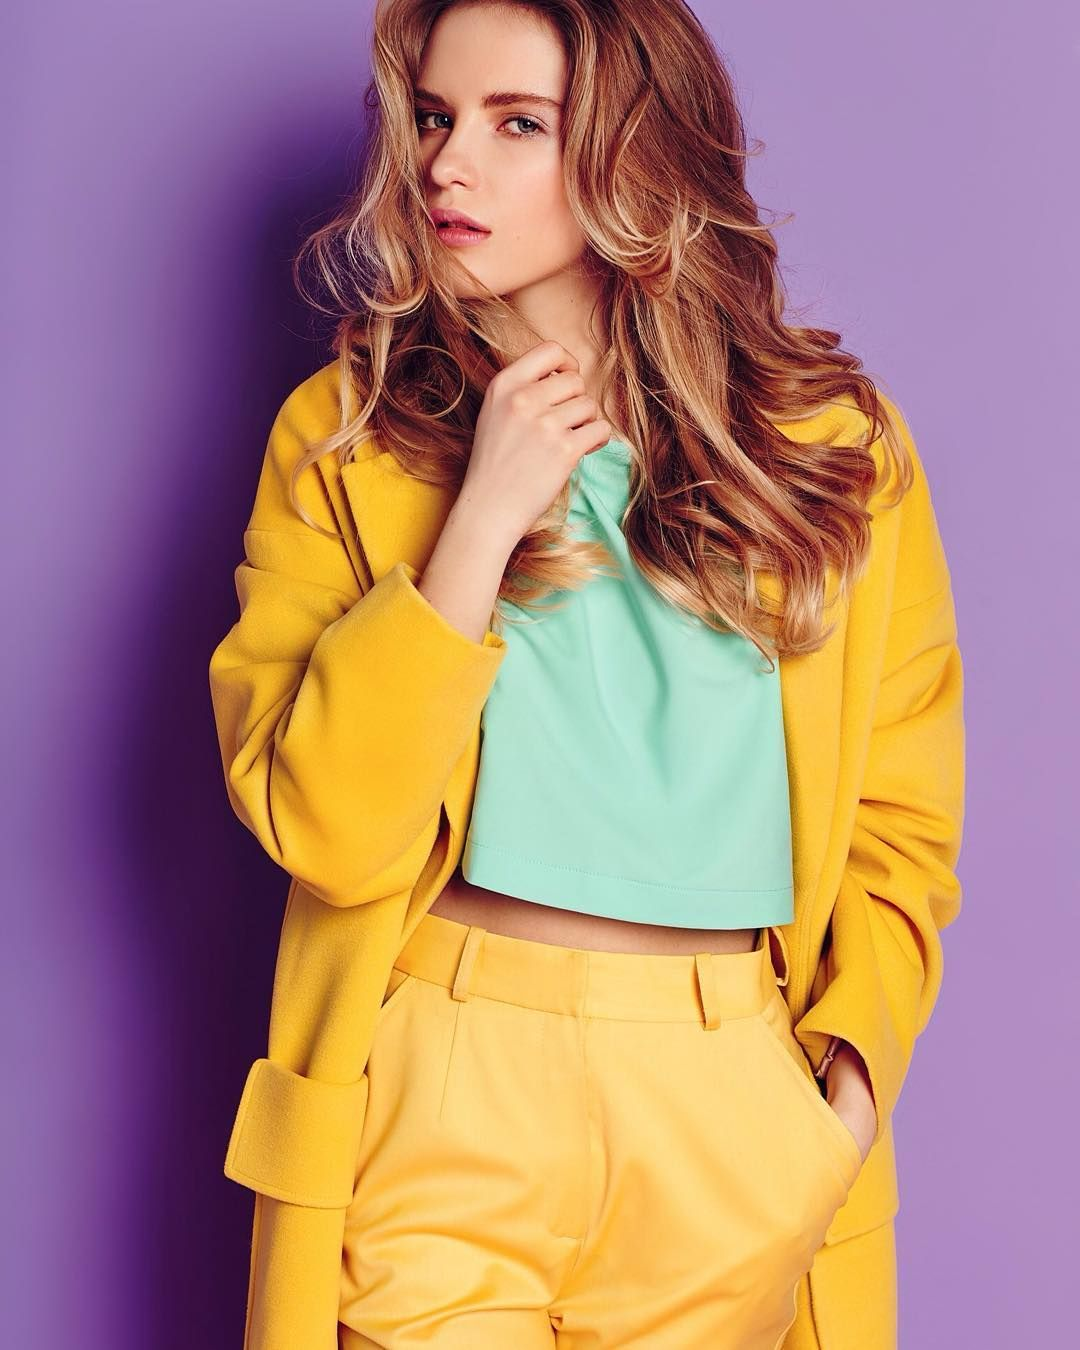 165 Me Gusta 2 Comentarios Polina Grishenina Polinagrishenina En Instagram Model Ratnikovatanya Stil Maison De Marie Viza Fashion Style Women S Top